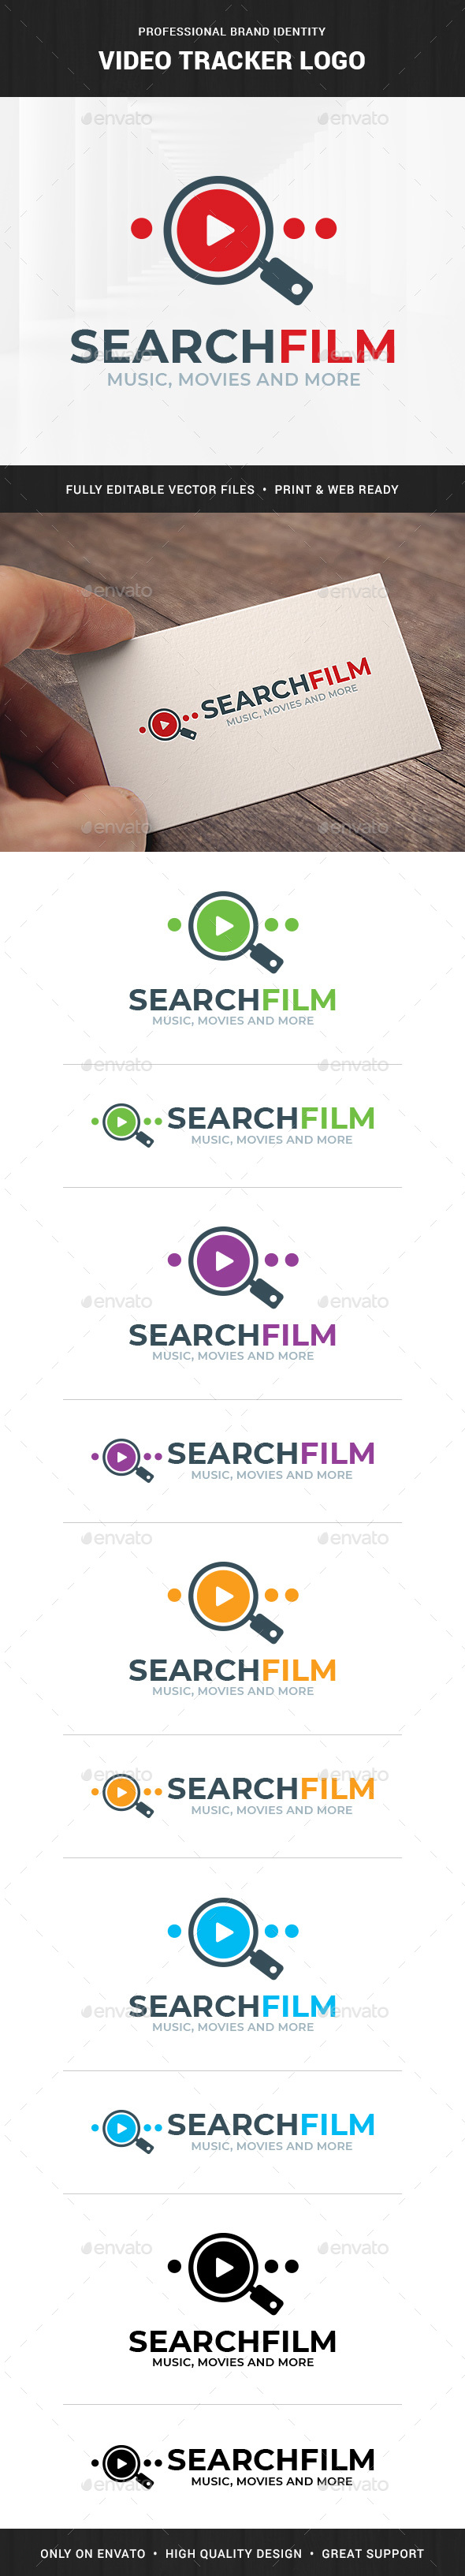 Video Tracker Logo Template - Objects Logo Templates